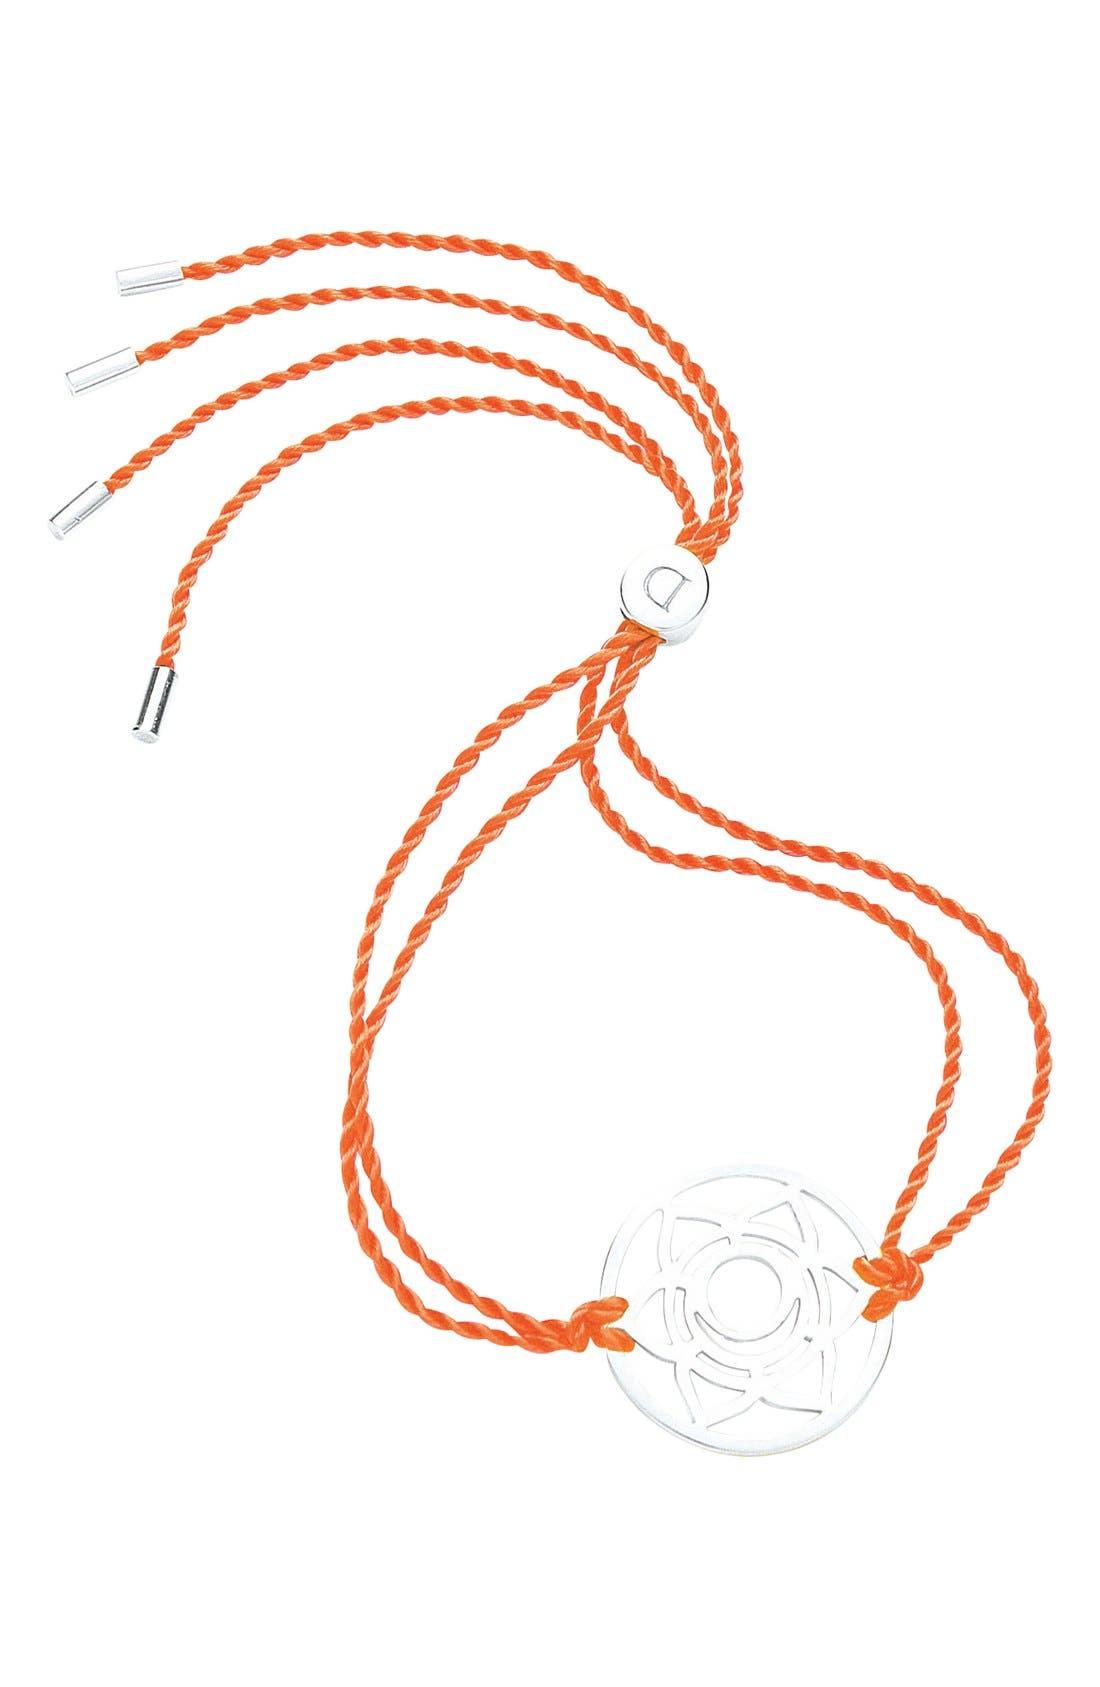 Alternate Image 1 Selected - Daisy London 'Sacral Chakra' Cord Bracelet